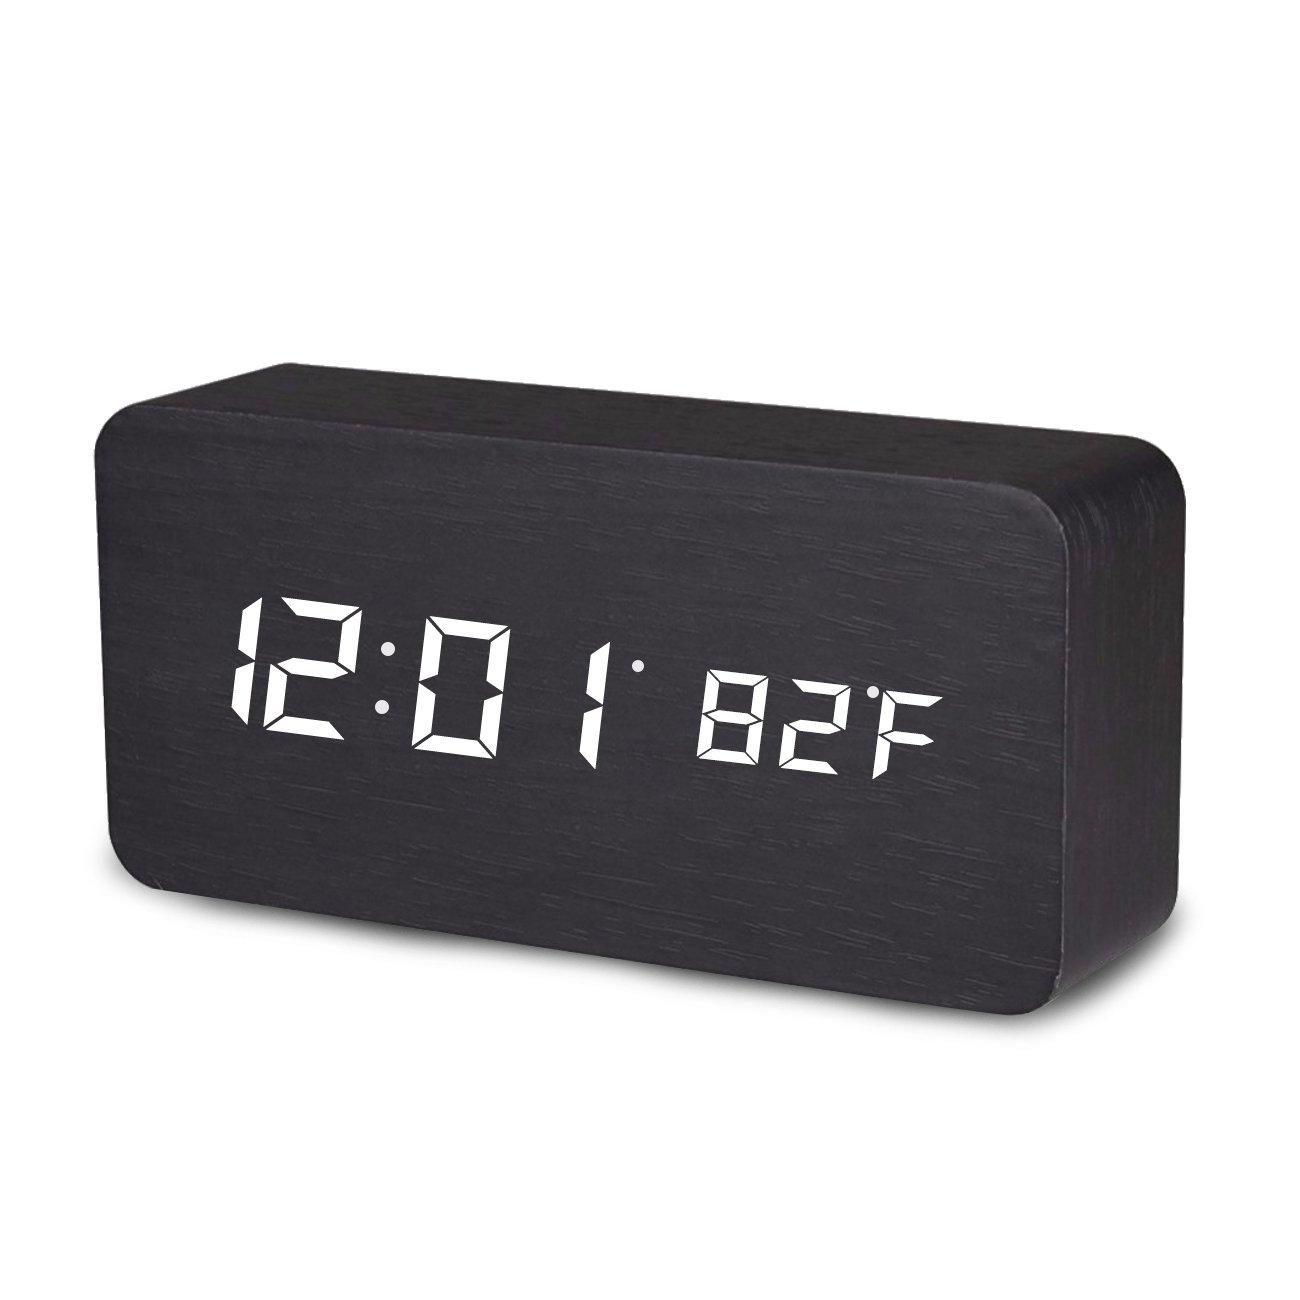 Digital Alarm Clock, Temperature Date LED Display Wood Grain Clock 3 Levels Brightness Voice Control Modern Simplicity Wood Digital Clock (Black) MiToo